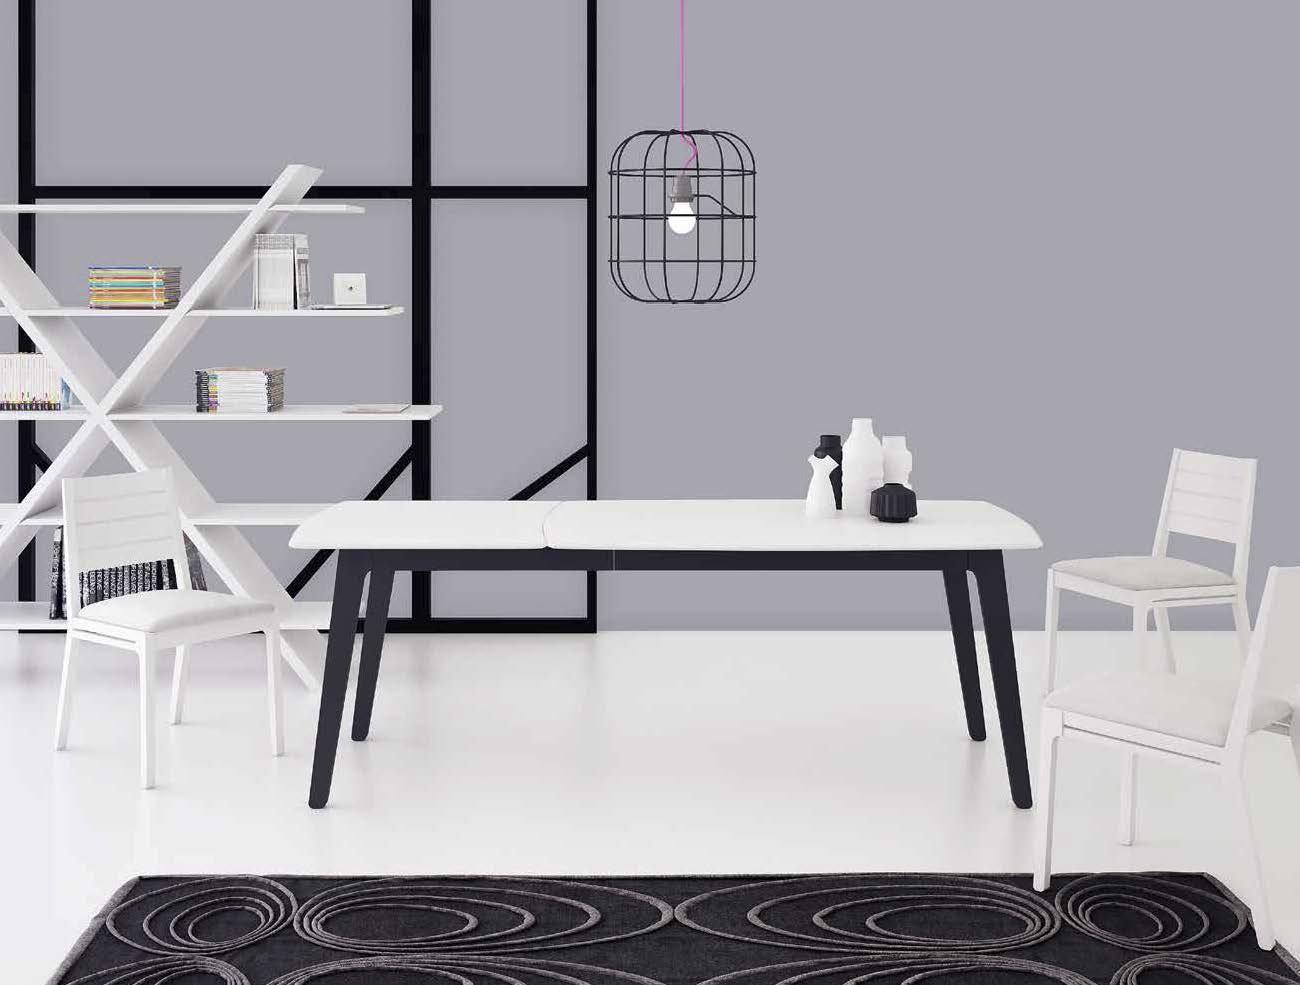 Tiendas De Muebles En Yecla Catalogos Finest Serie De Almacenaje  # Muebles Eva Yecla